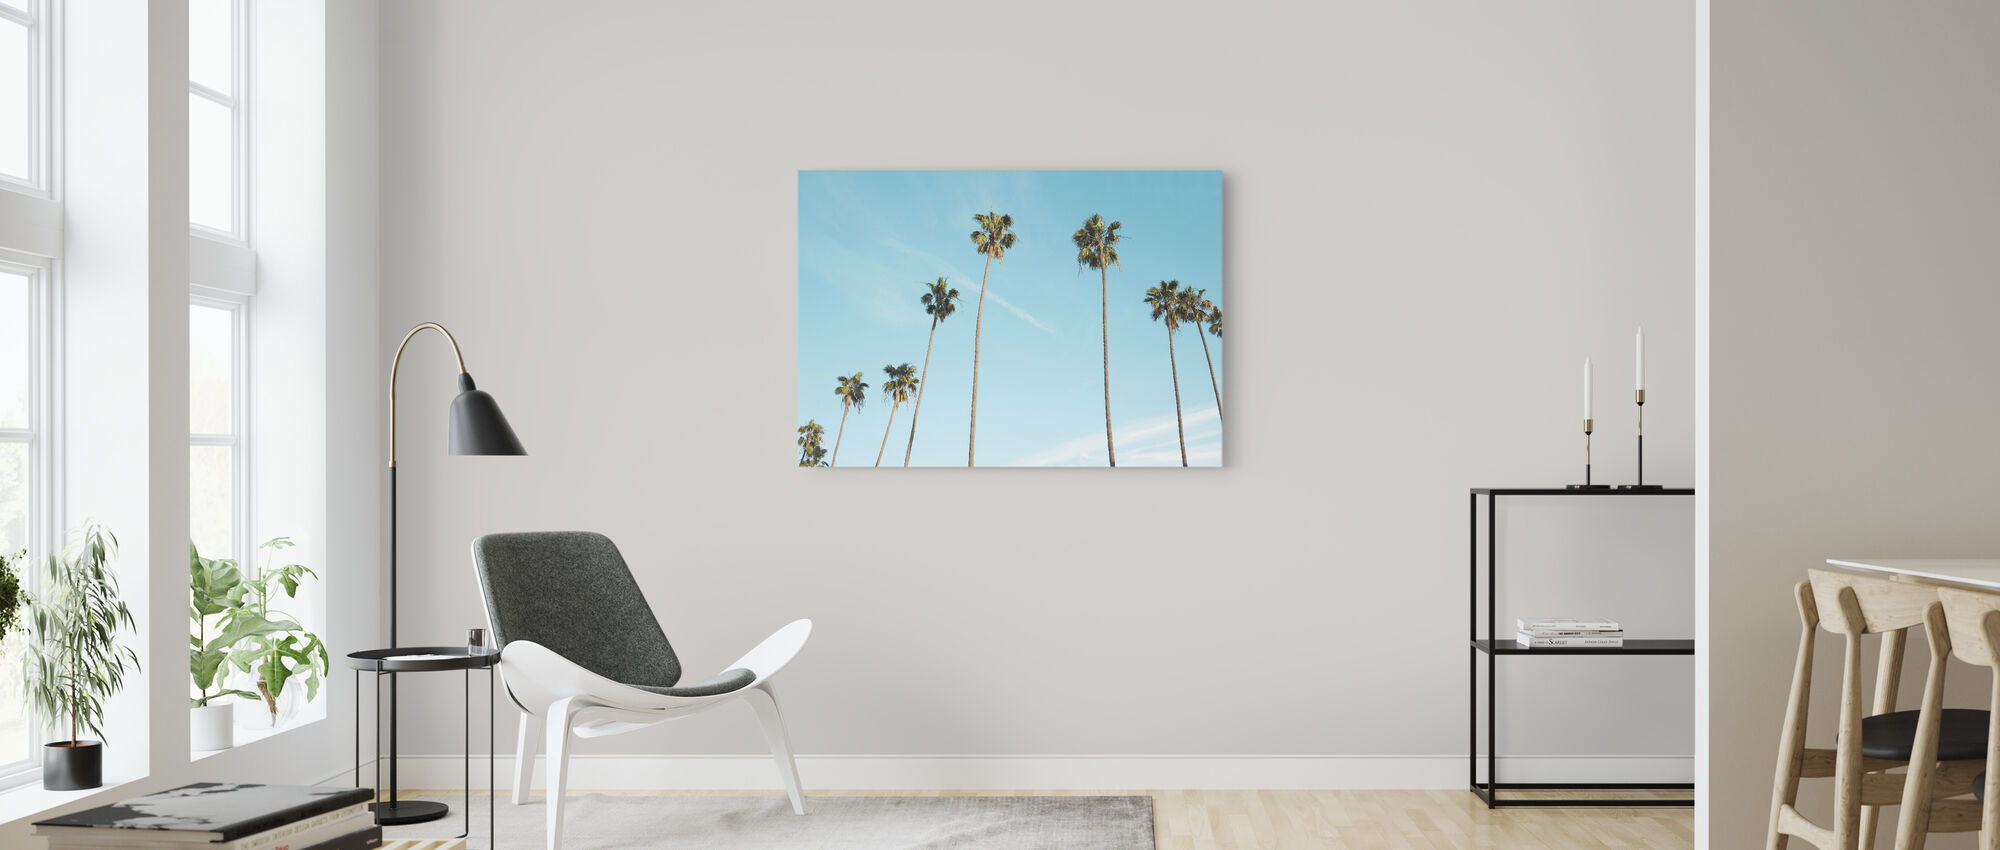 Palmbomen - Canvas print - Woonkamer